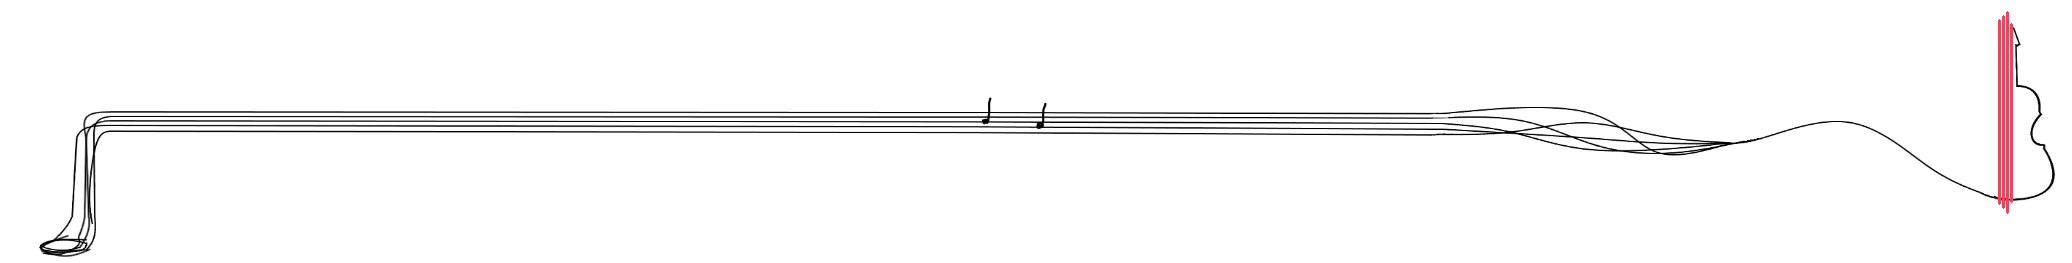 Music-based border